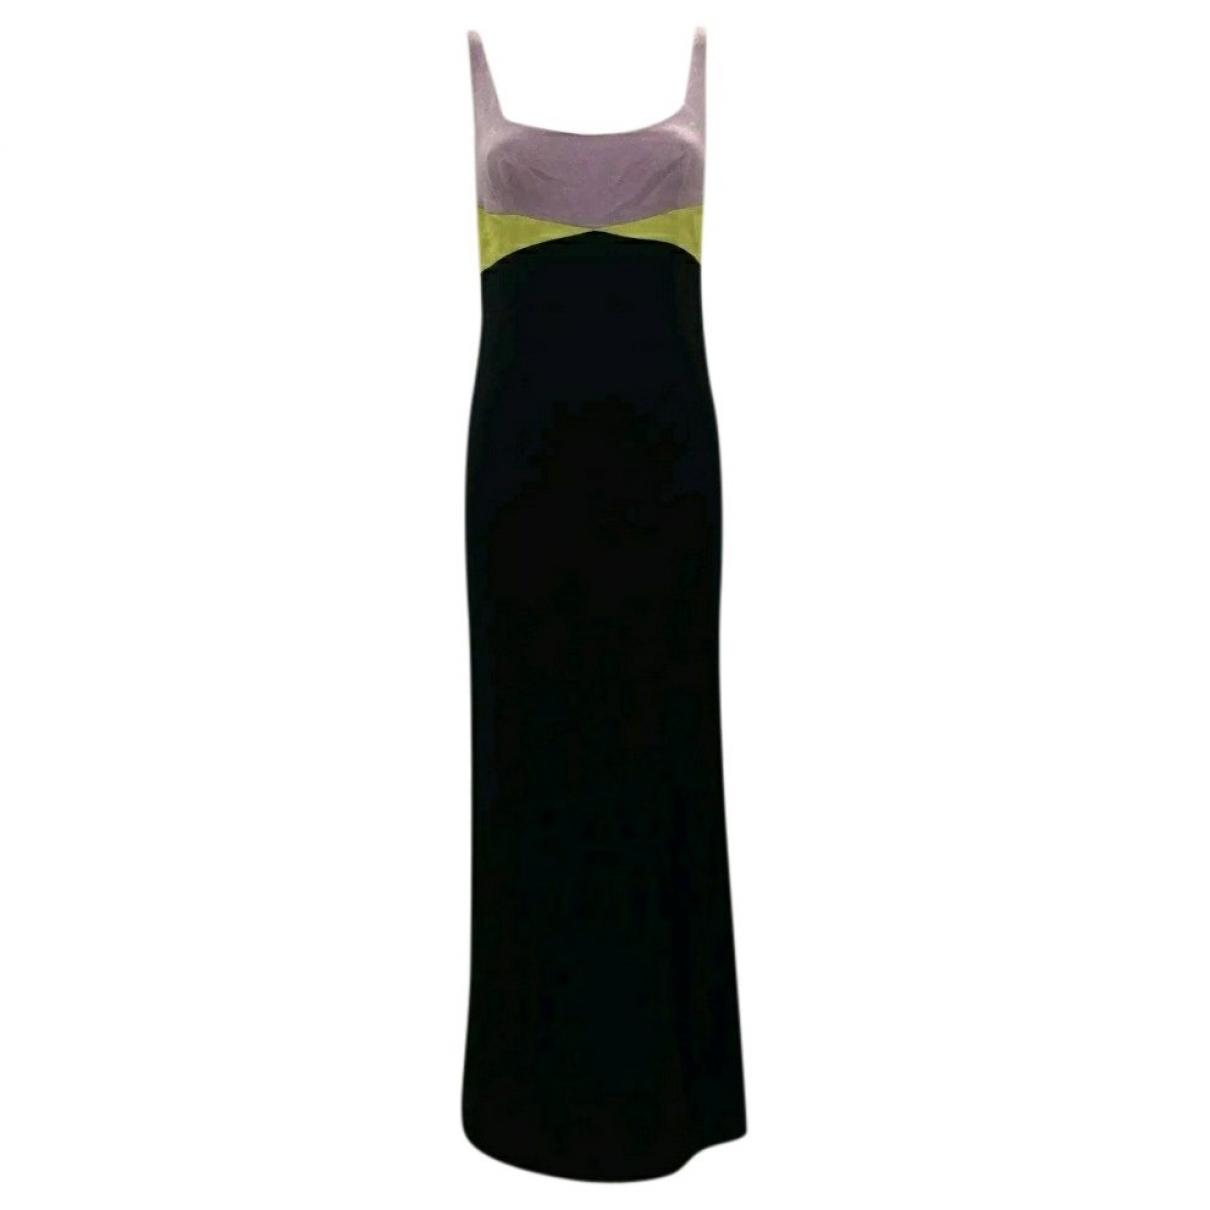 Gianni Versace \N Metallic dress for Women 40 IT